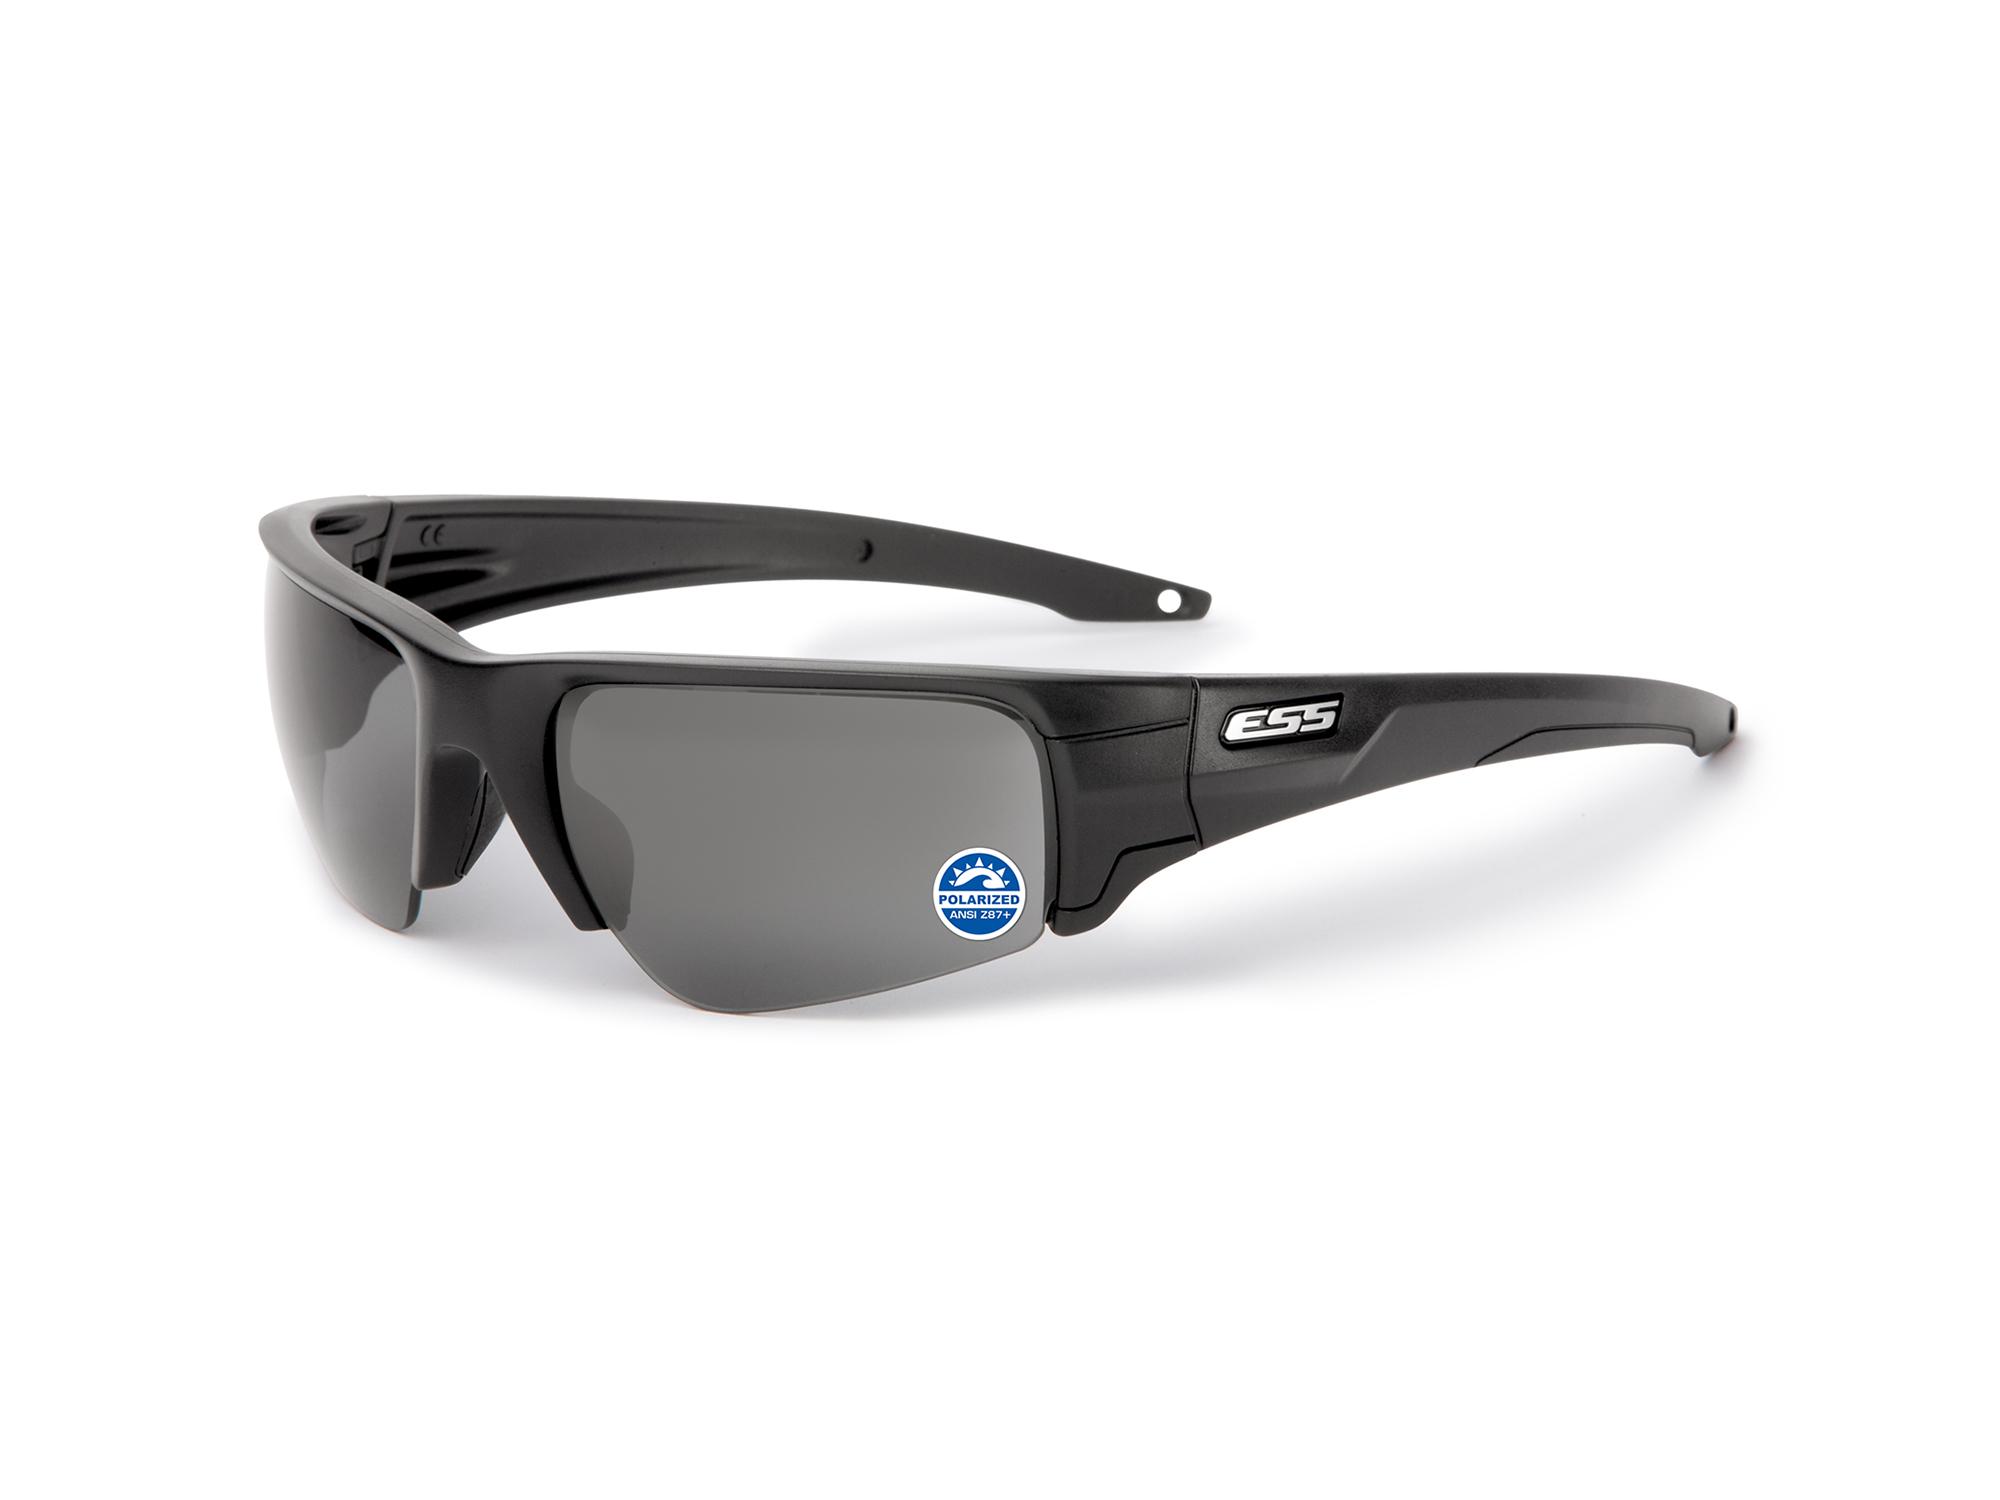 EE9019-03 フレーム:ブラック、レンズ:偏光ミラーグレイ、シルバーLOGO